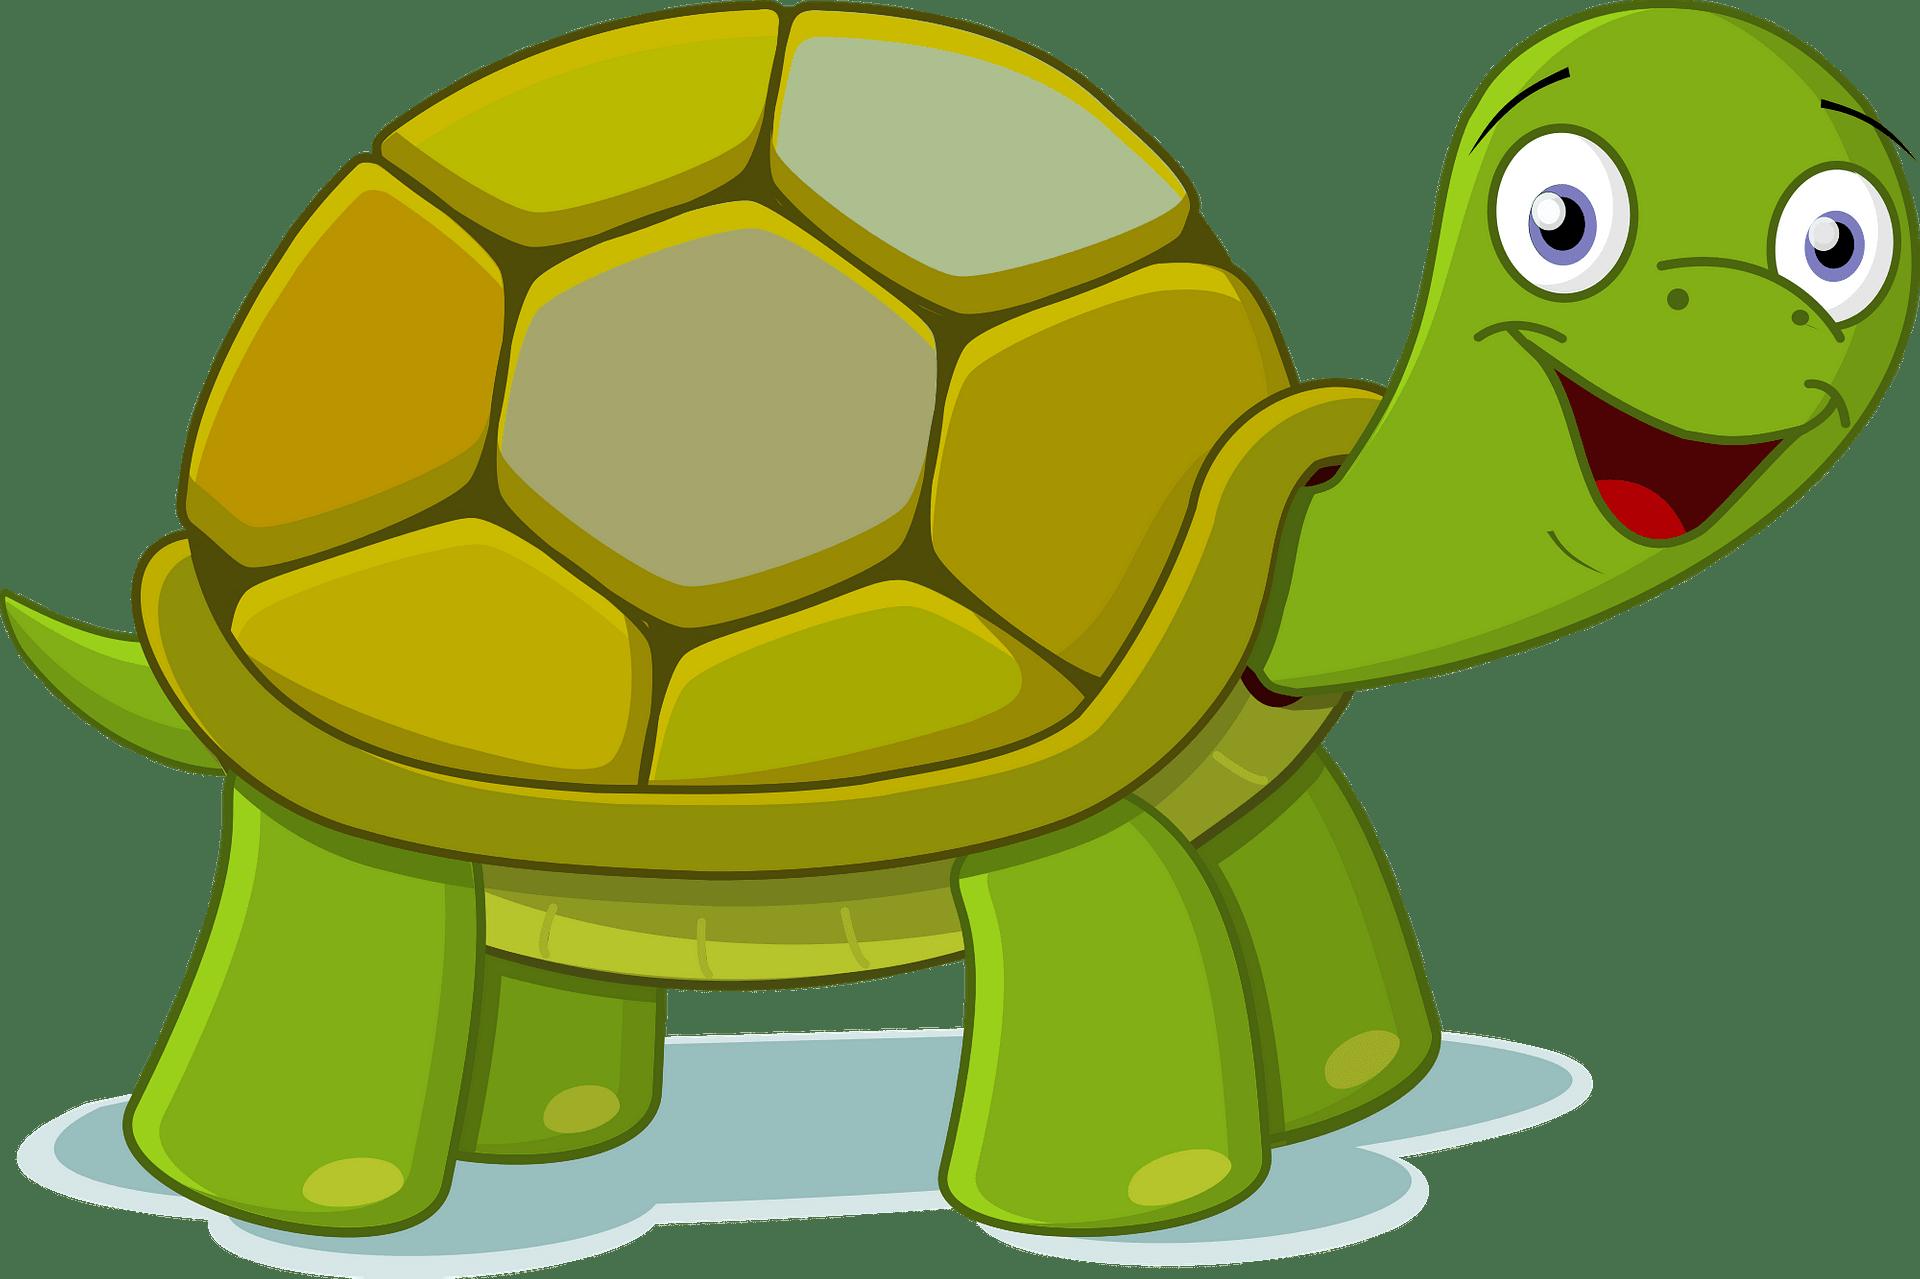 Tortuga sonriente clipart. Dibujos animados descargar gratis.